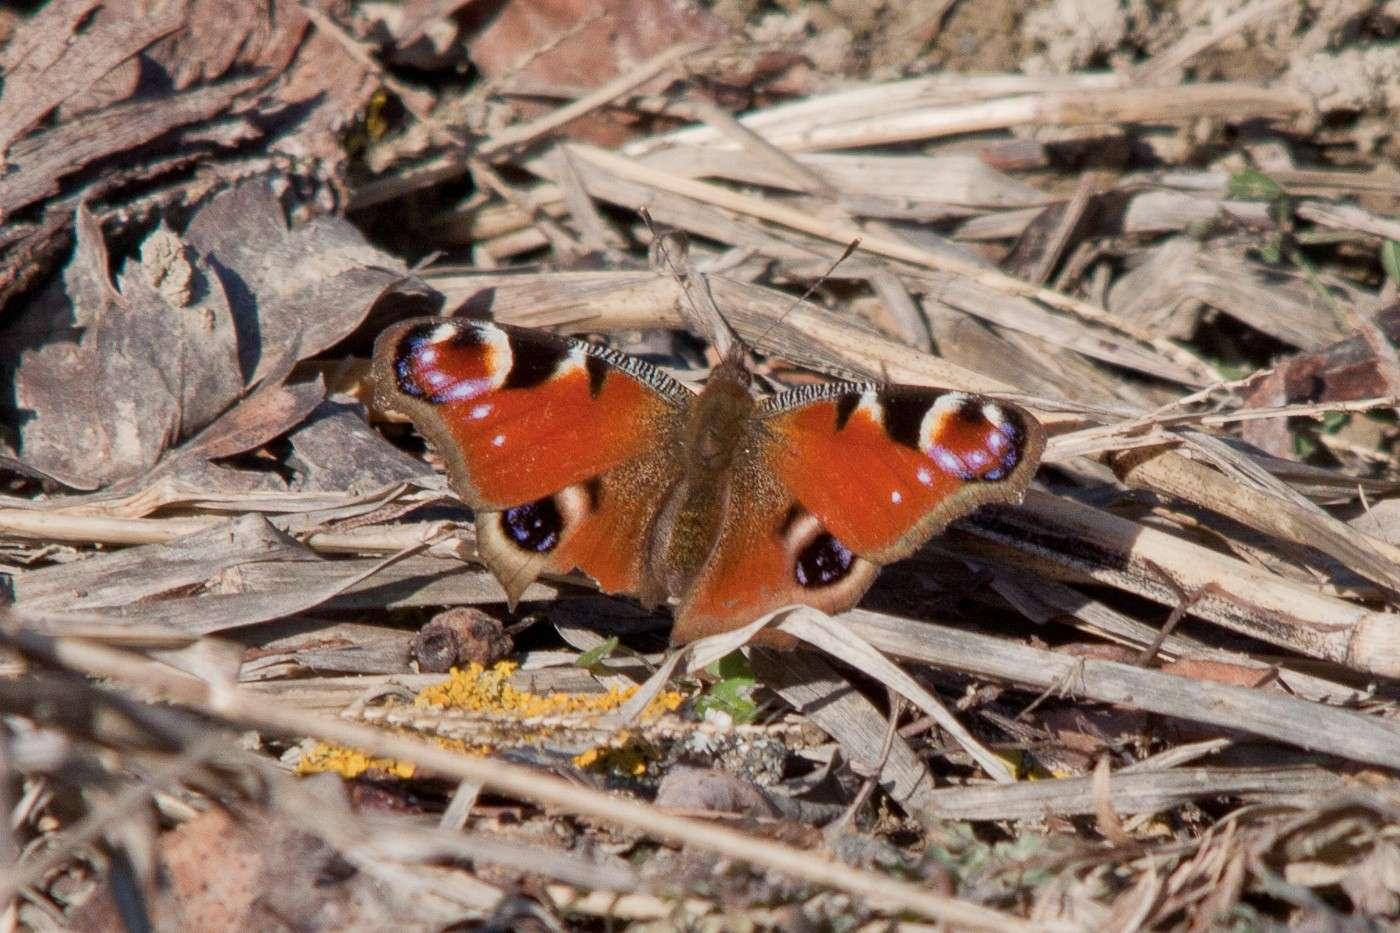 Una farfalla oggi 6 febbraio 2011 Img_2511